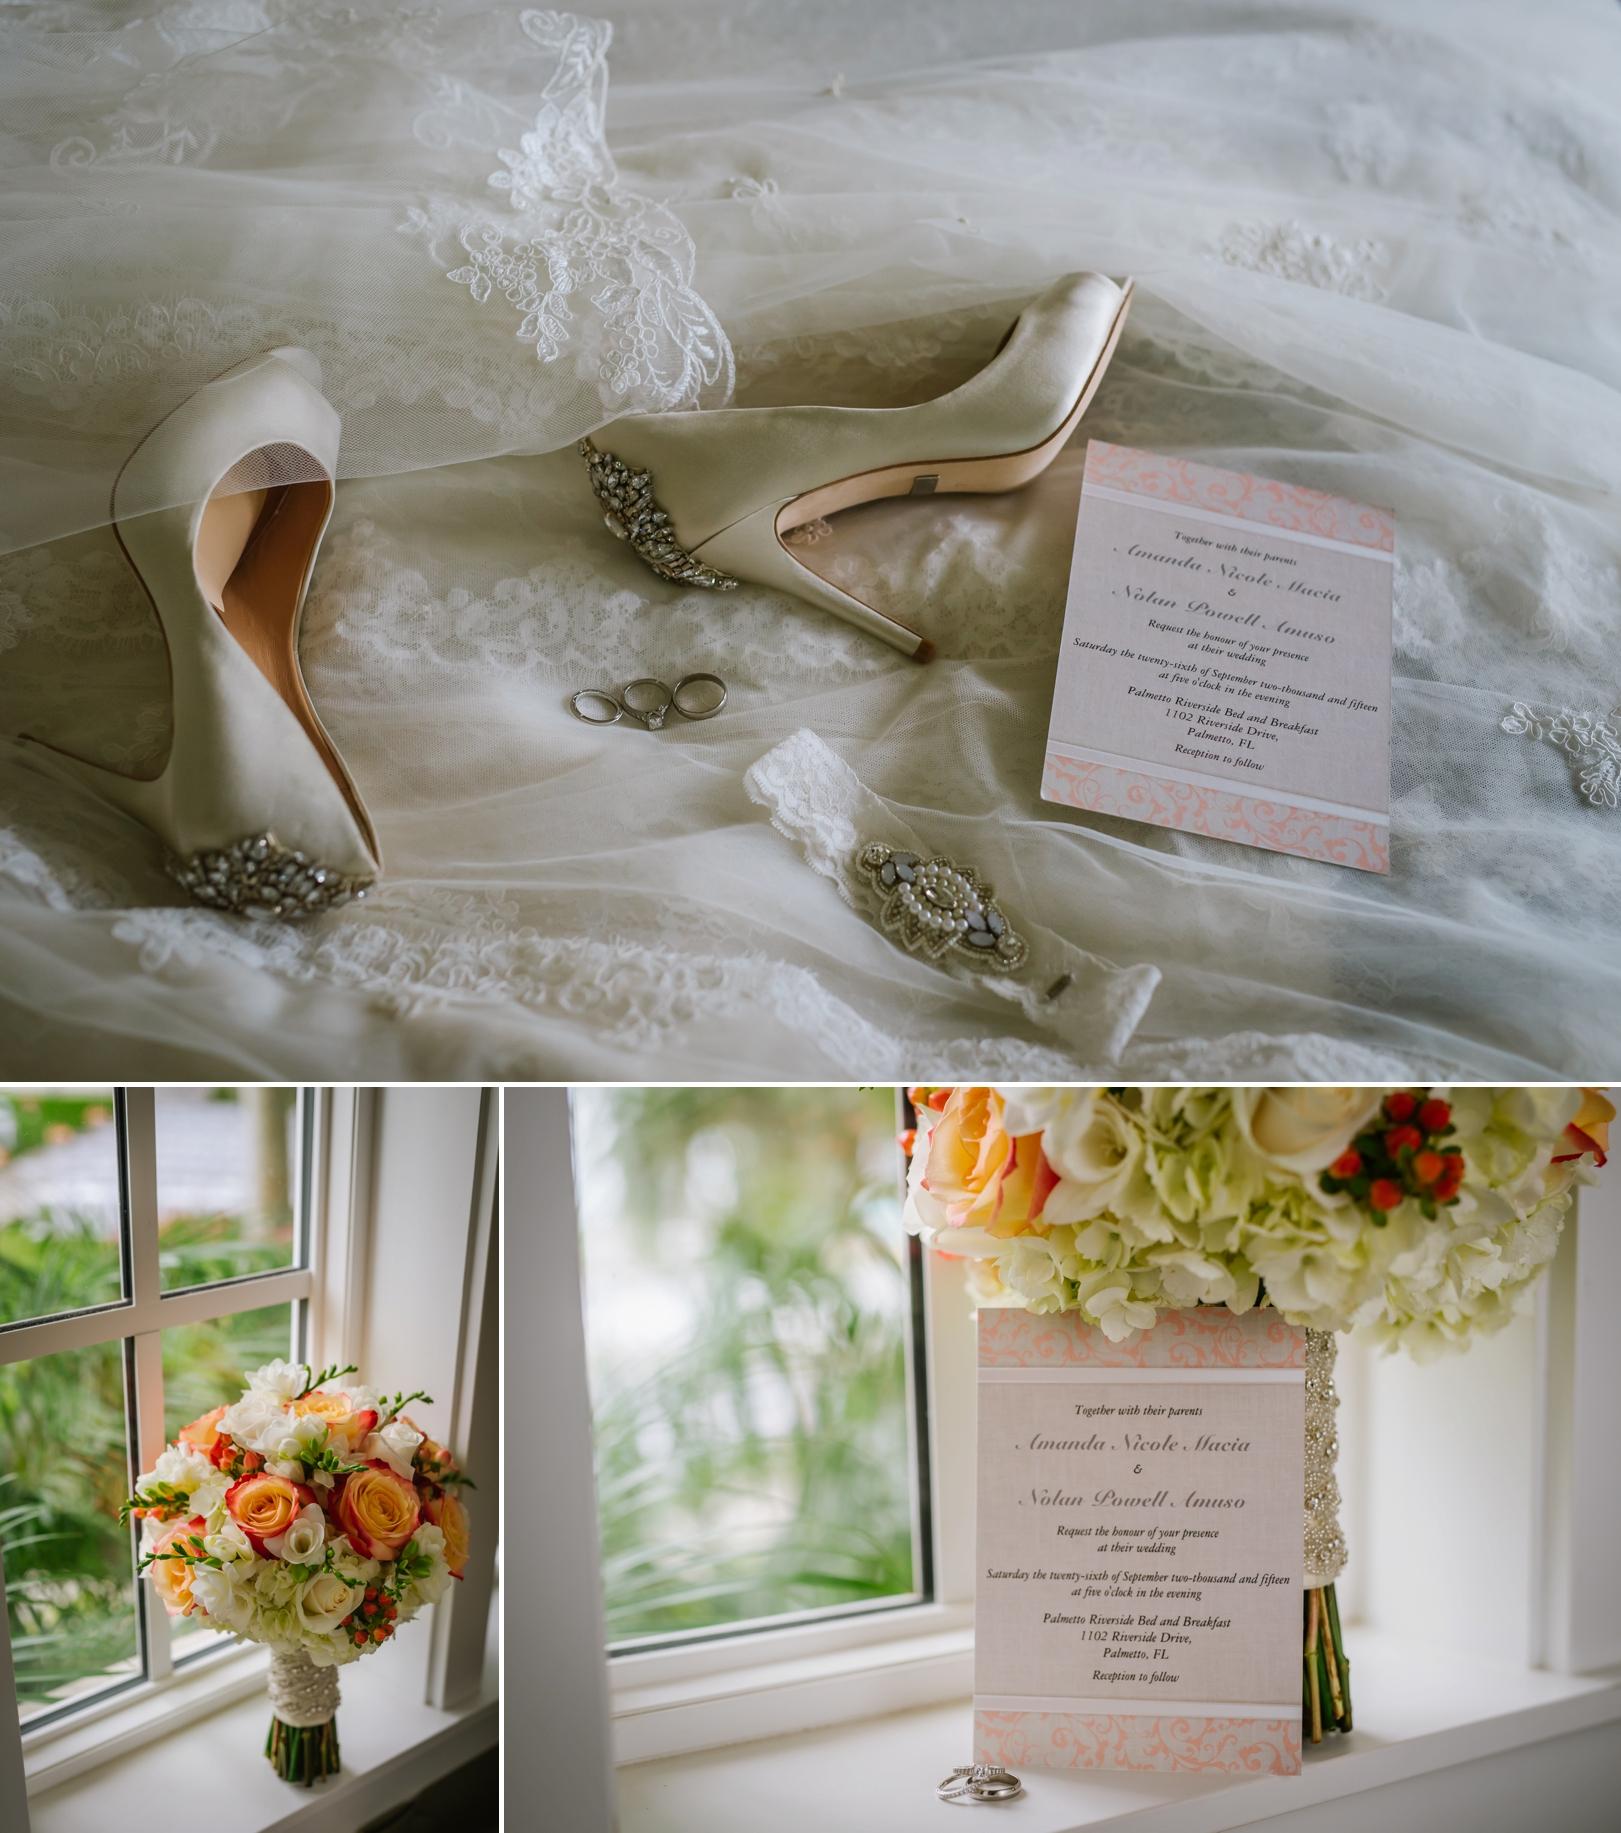 st-pete-bed-breakfast-wedding-photography_0003.jpg